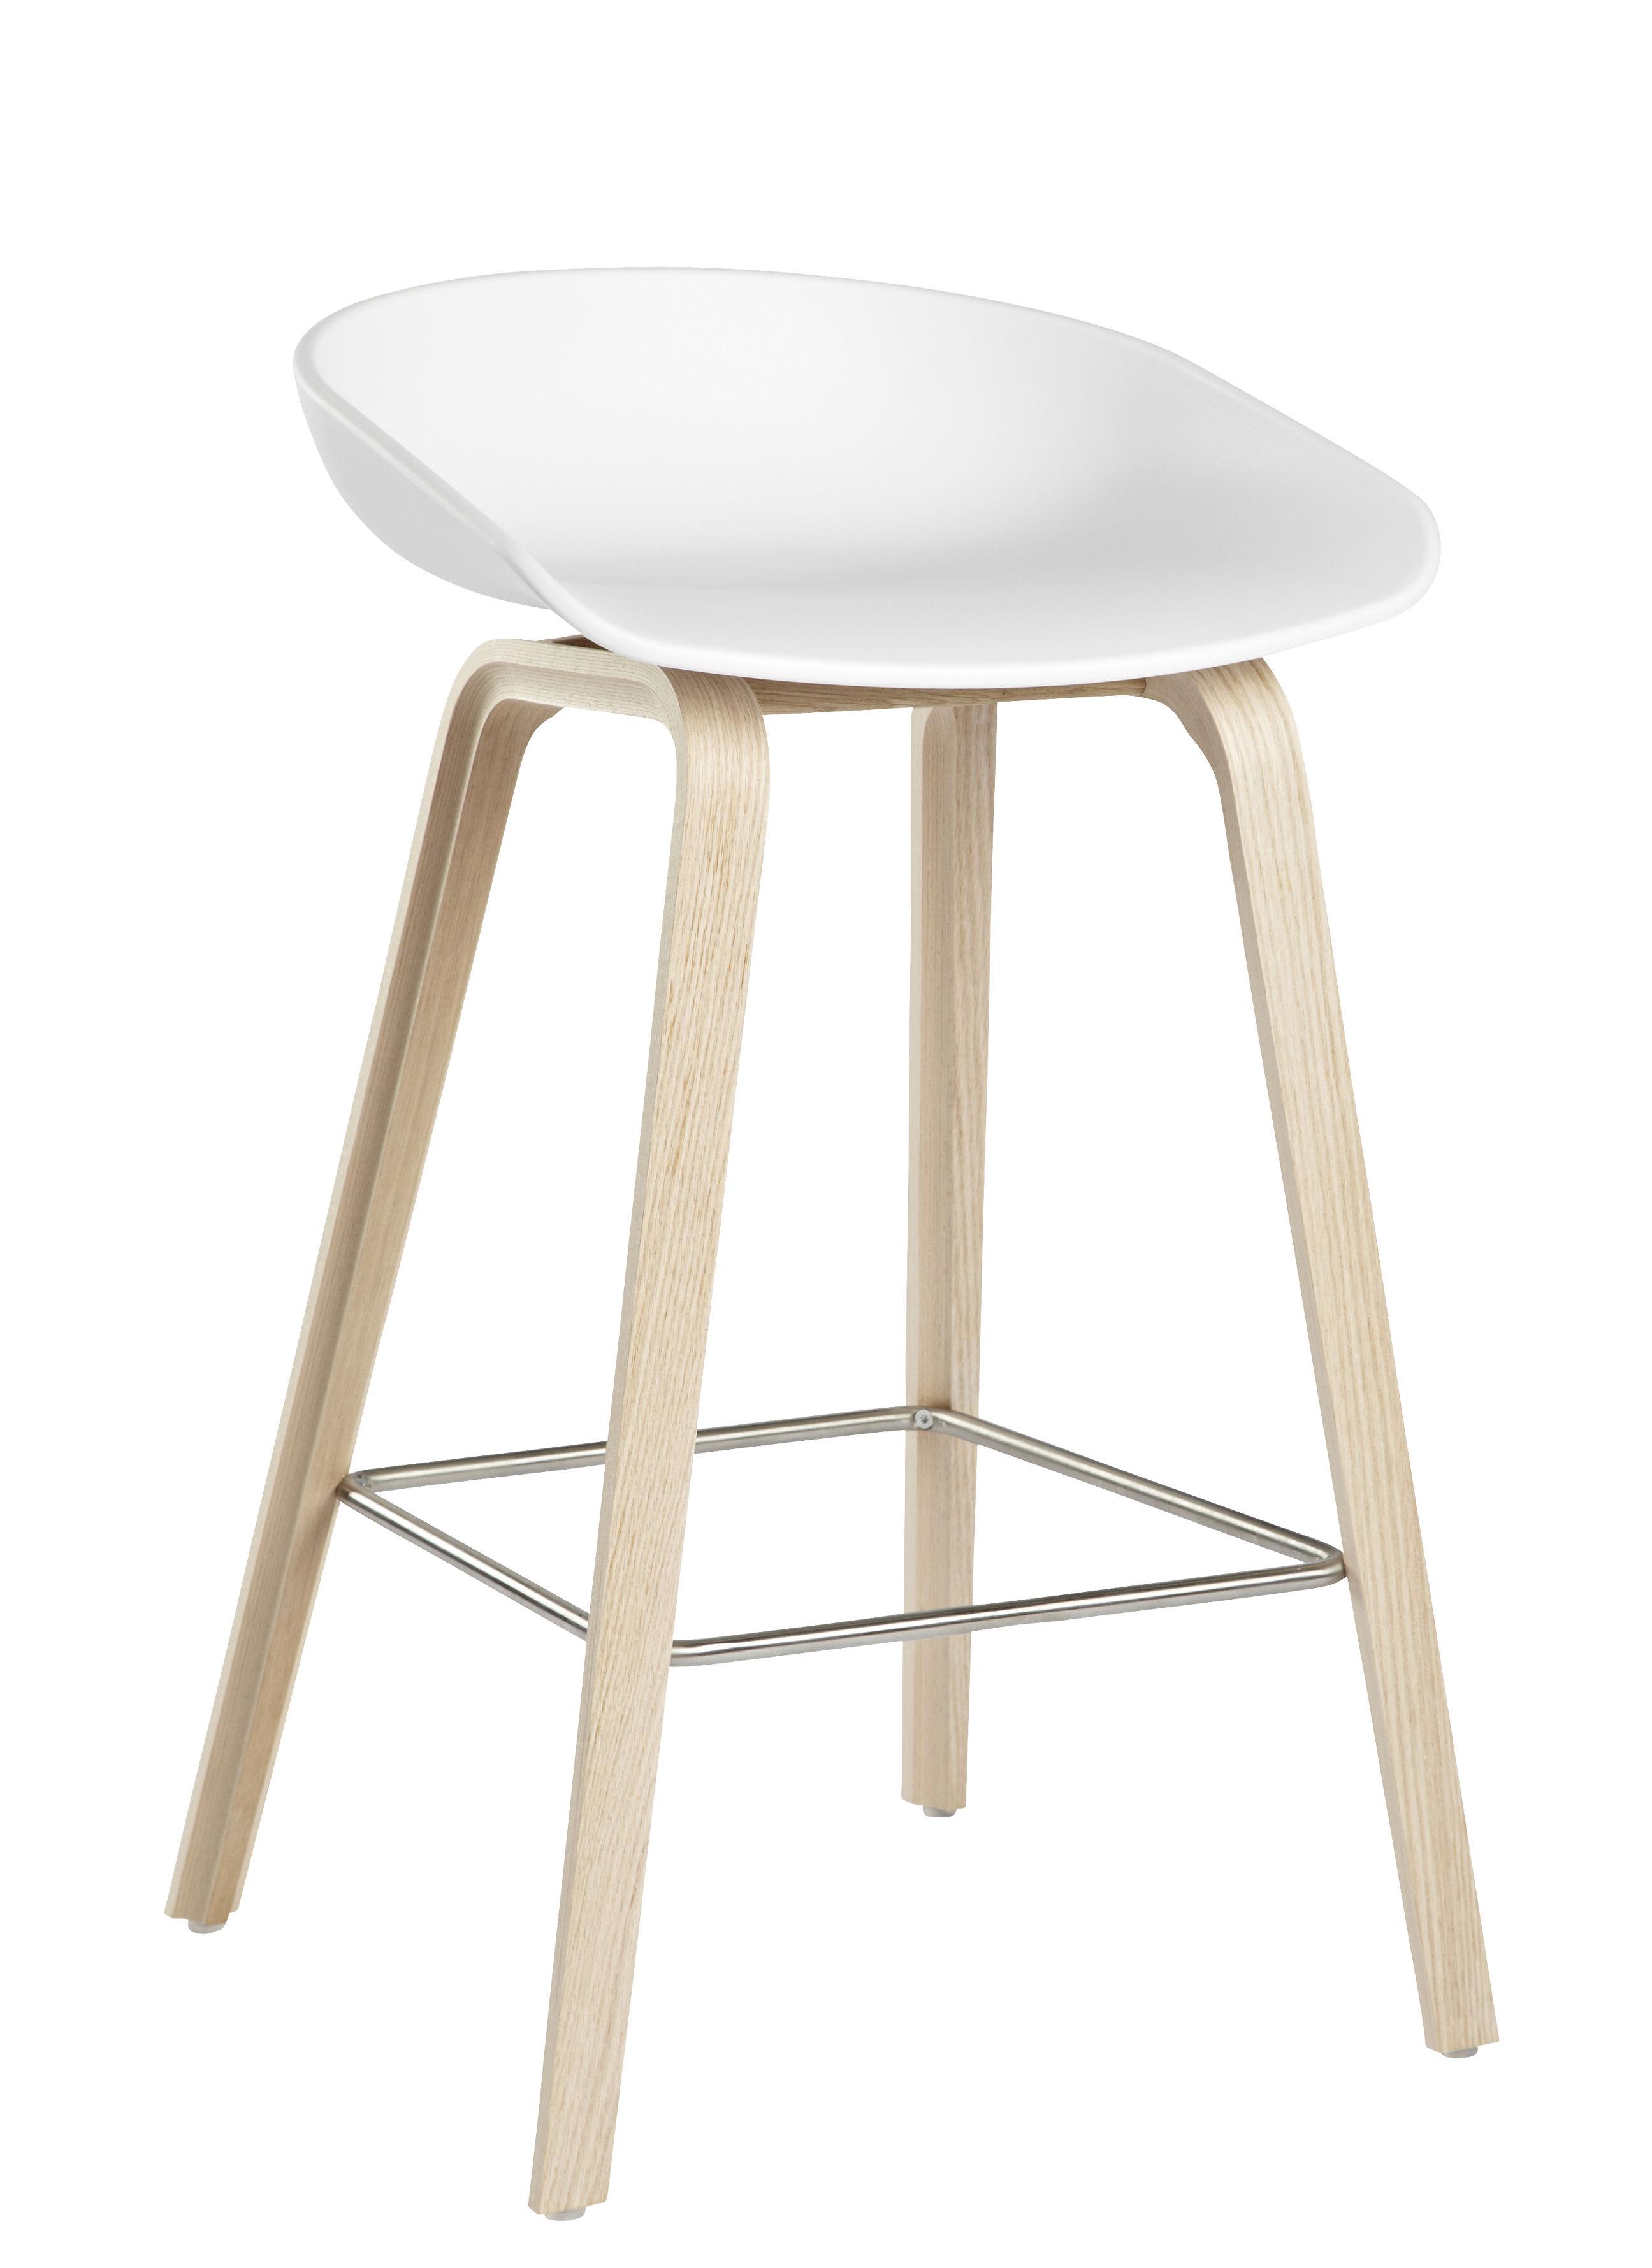 Arredamento - Sgabelli da bar  - Sgabello bar About a stool - / H 65 cm di Hay - Bianco / Gambe in legno naturale - Polipropilene, Rovere naturale